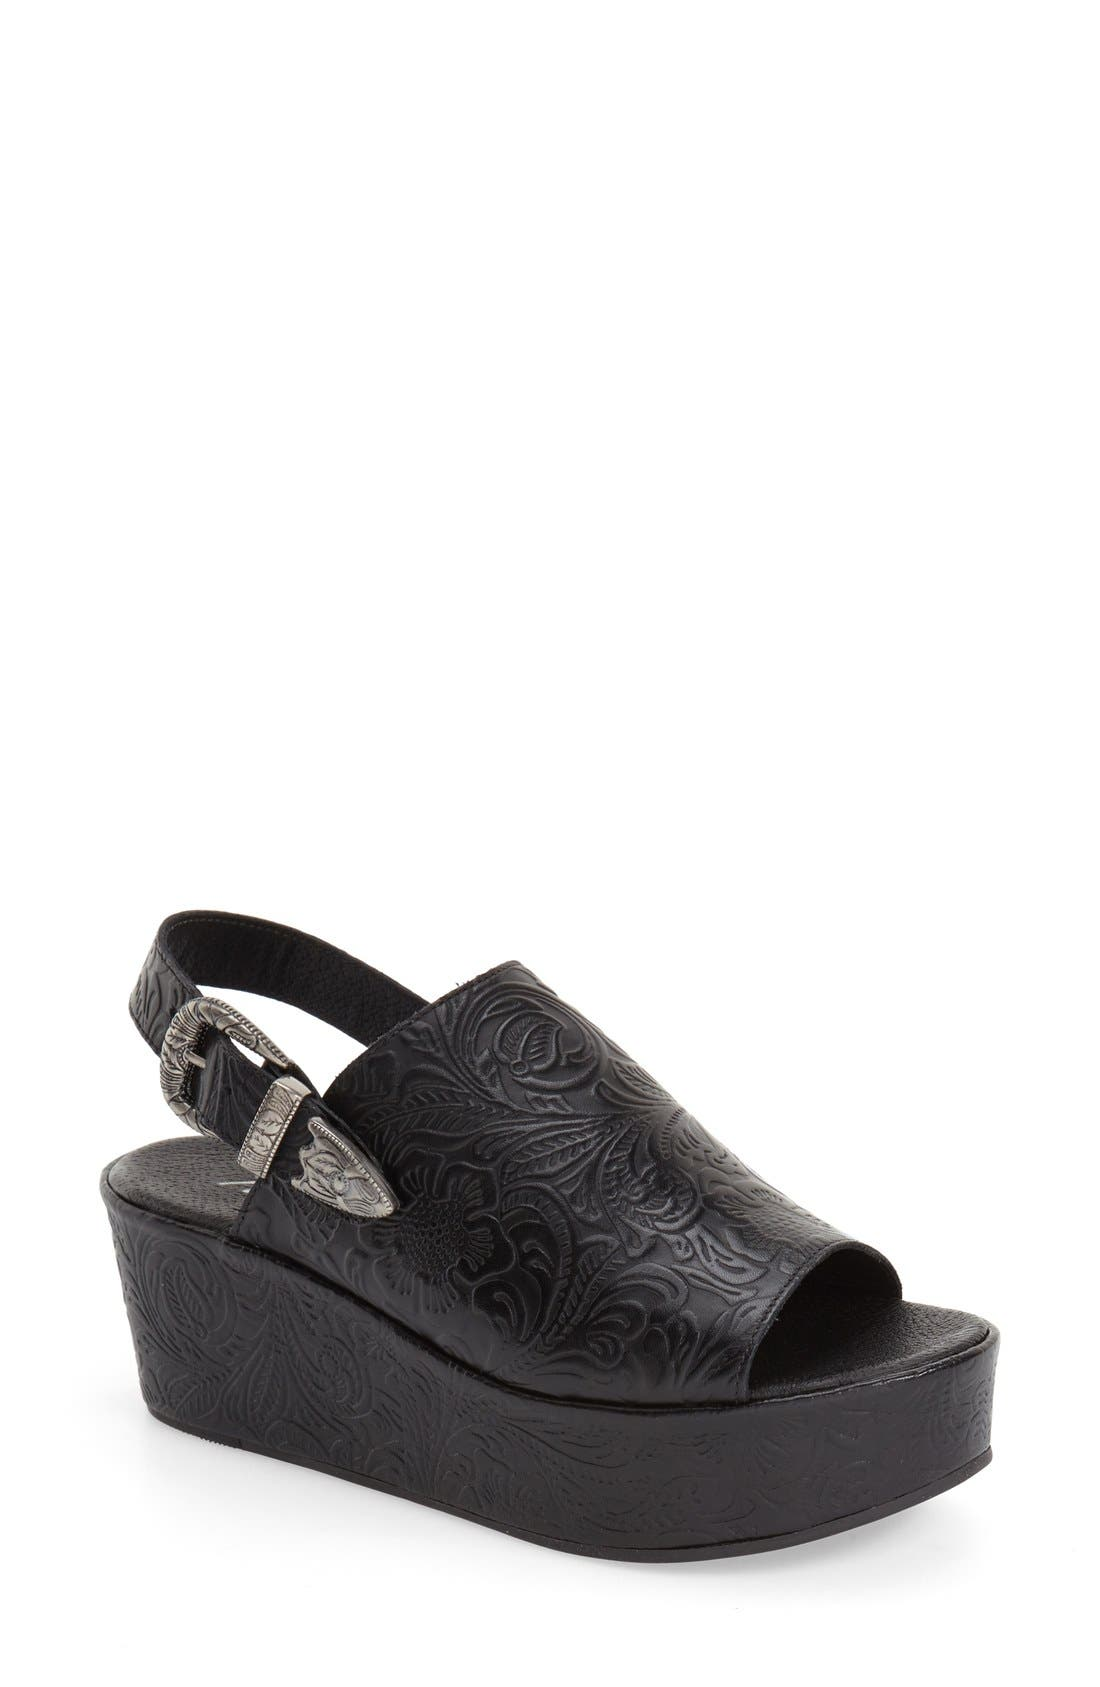 Alternate Image 1 Selected - Matisse Embossed Slingback Platform Sandal (Women)